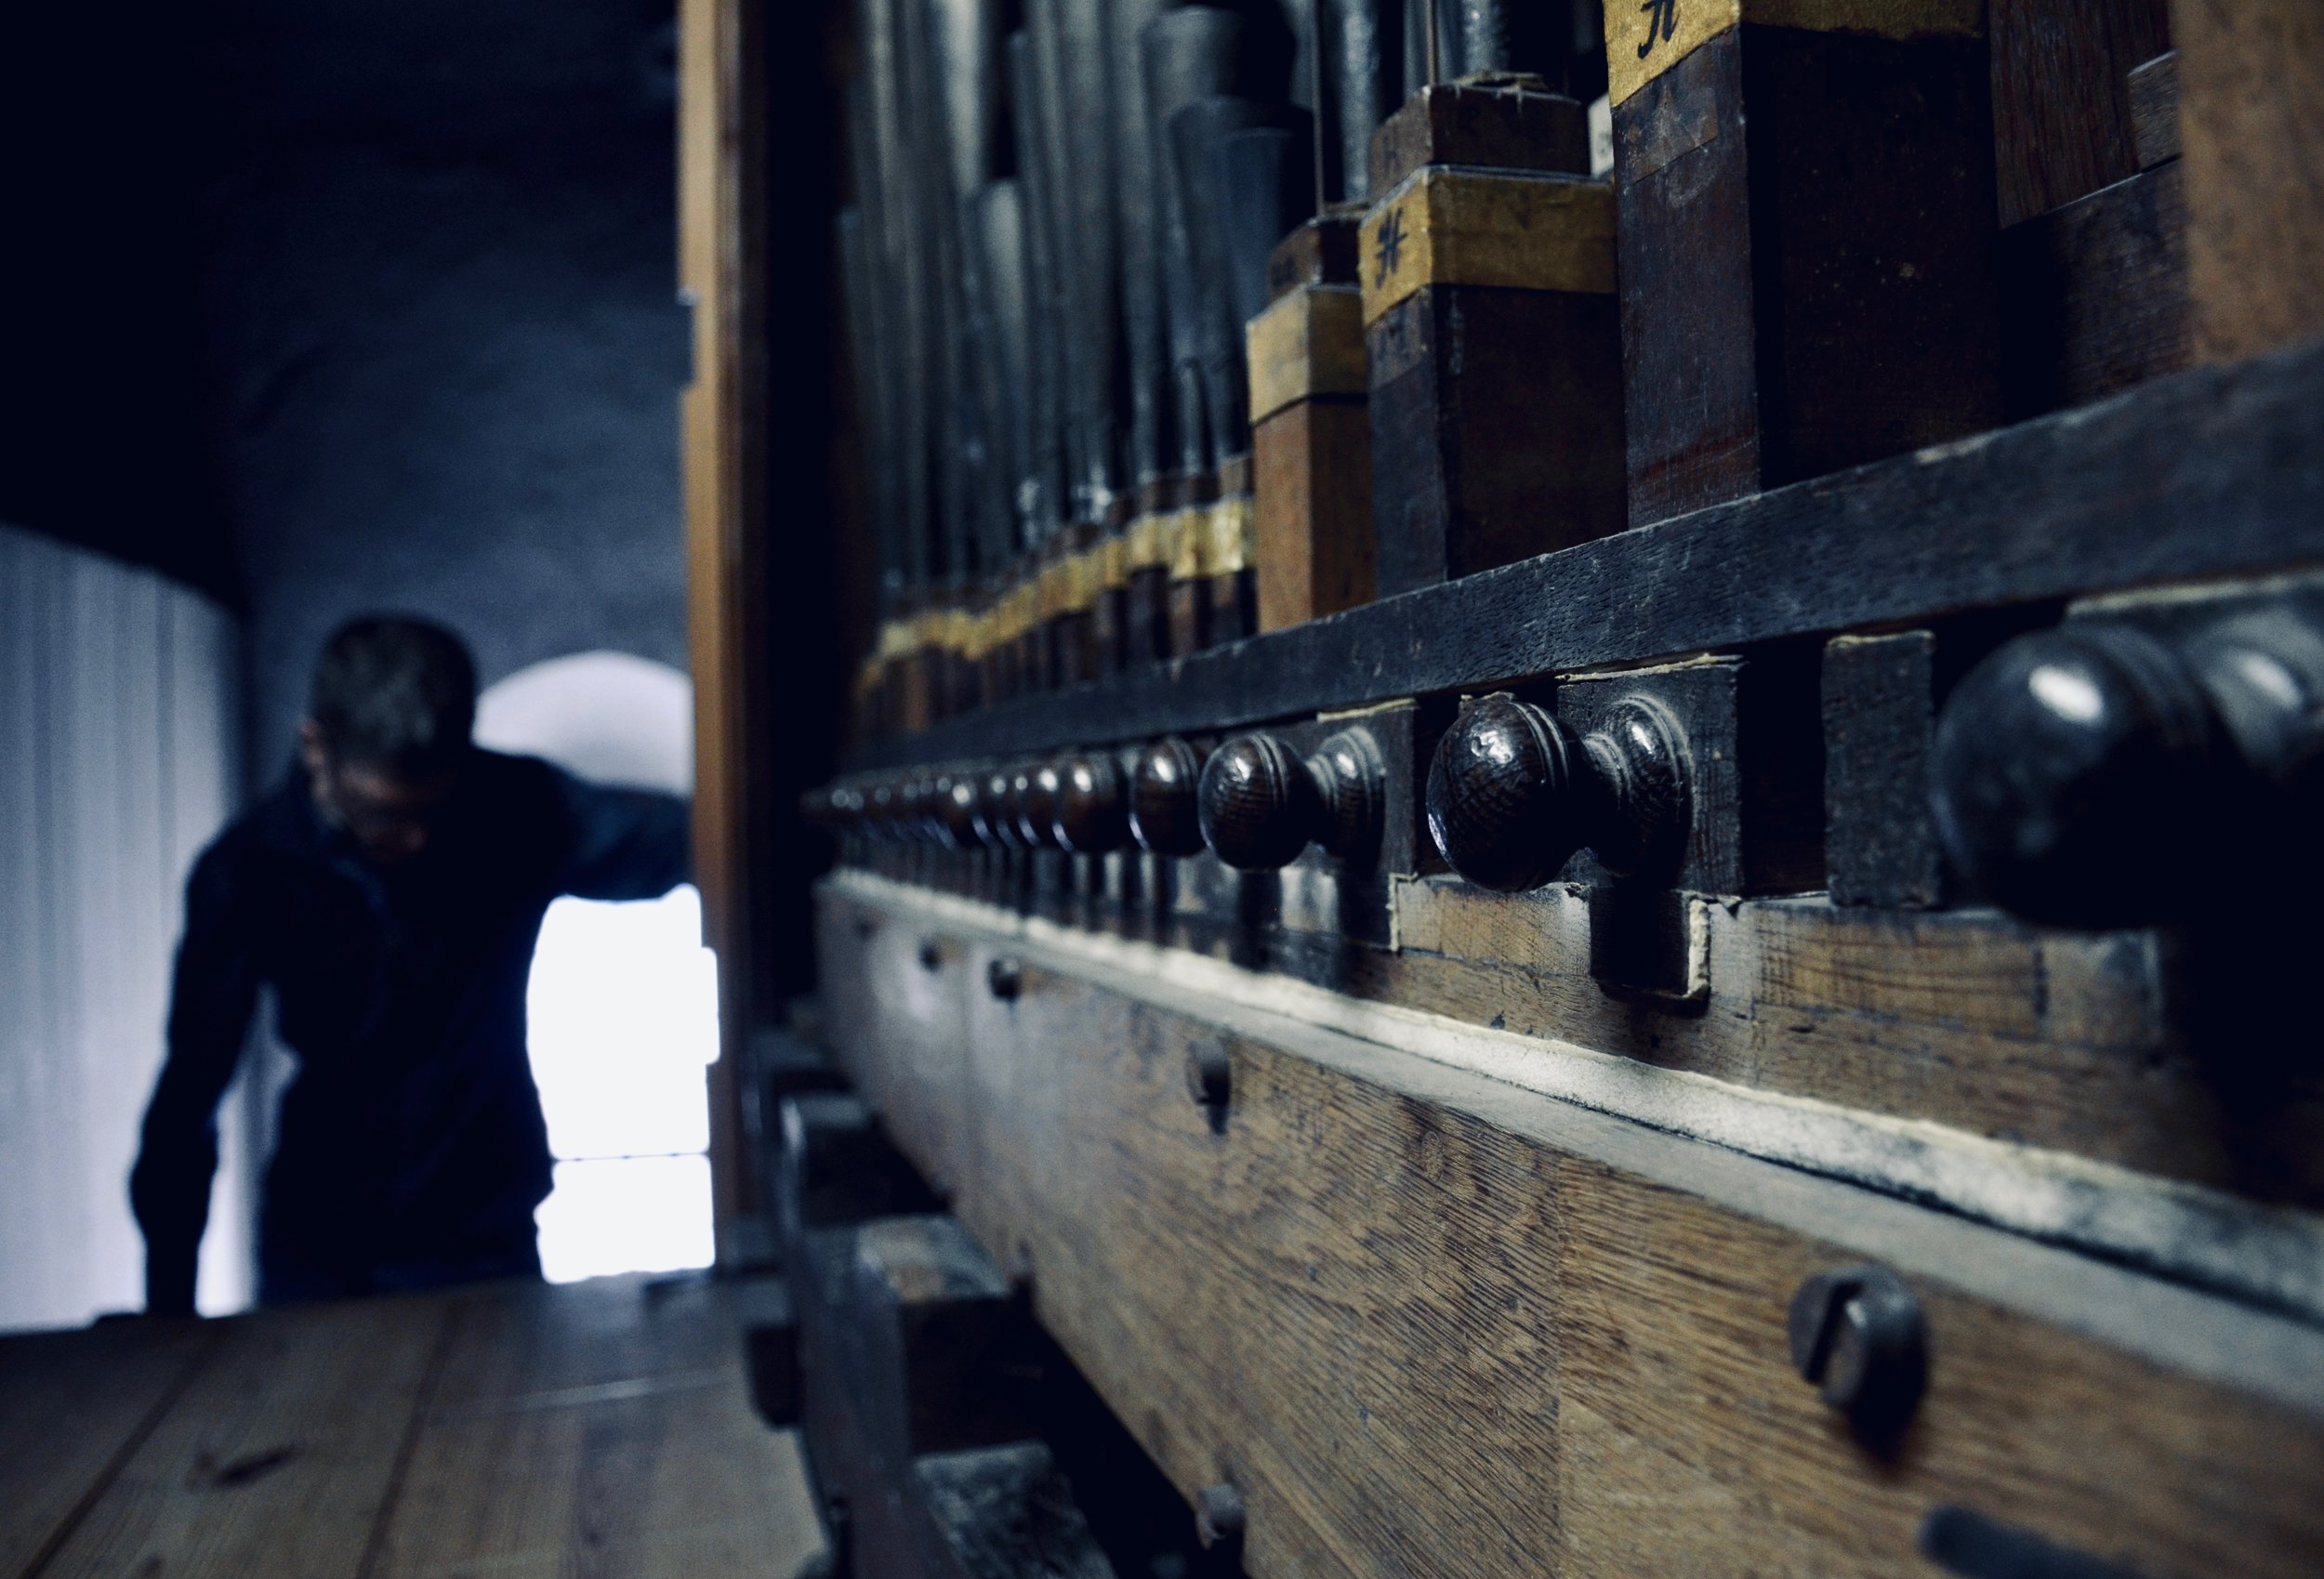 Mechanical detail (spring chests), 1669–73 Huß/Schnitger organ in St. Cosmæ, Stade. Boston Organ Studio.